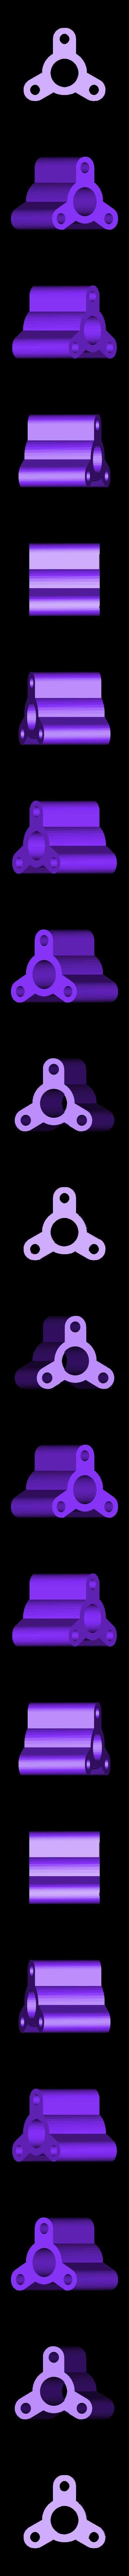 D52mm x L40mm Spool adapter A.STL Download STL file Spool Holder Hub Adapters • Template to 3D print, PlanetBlue